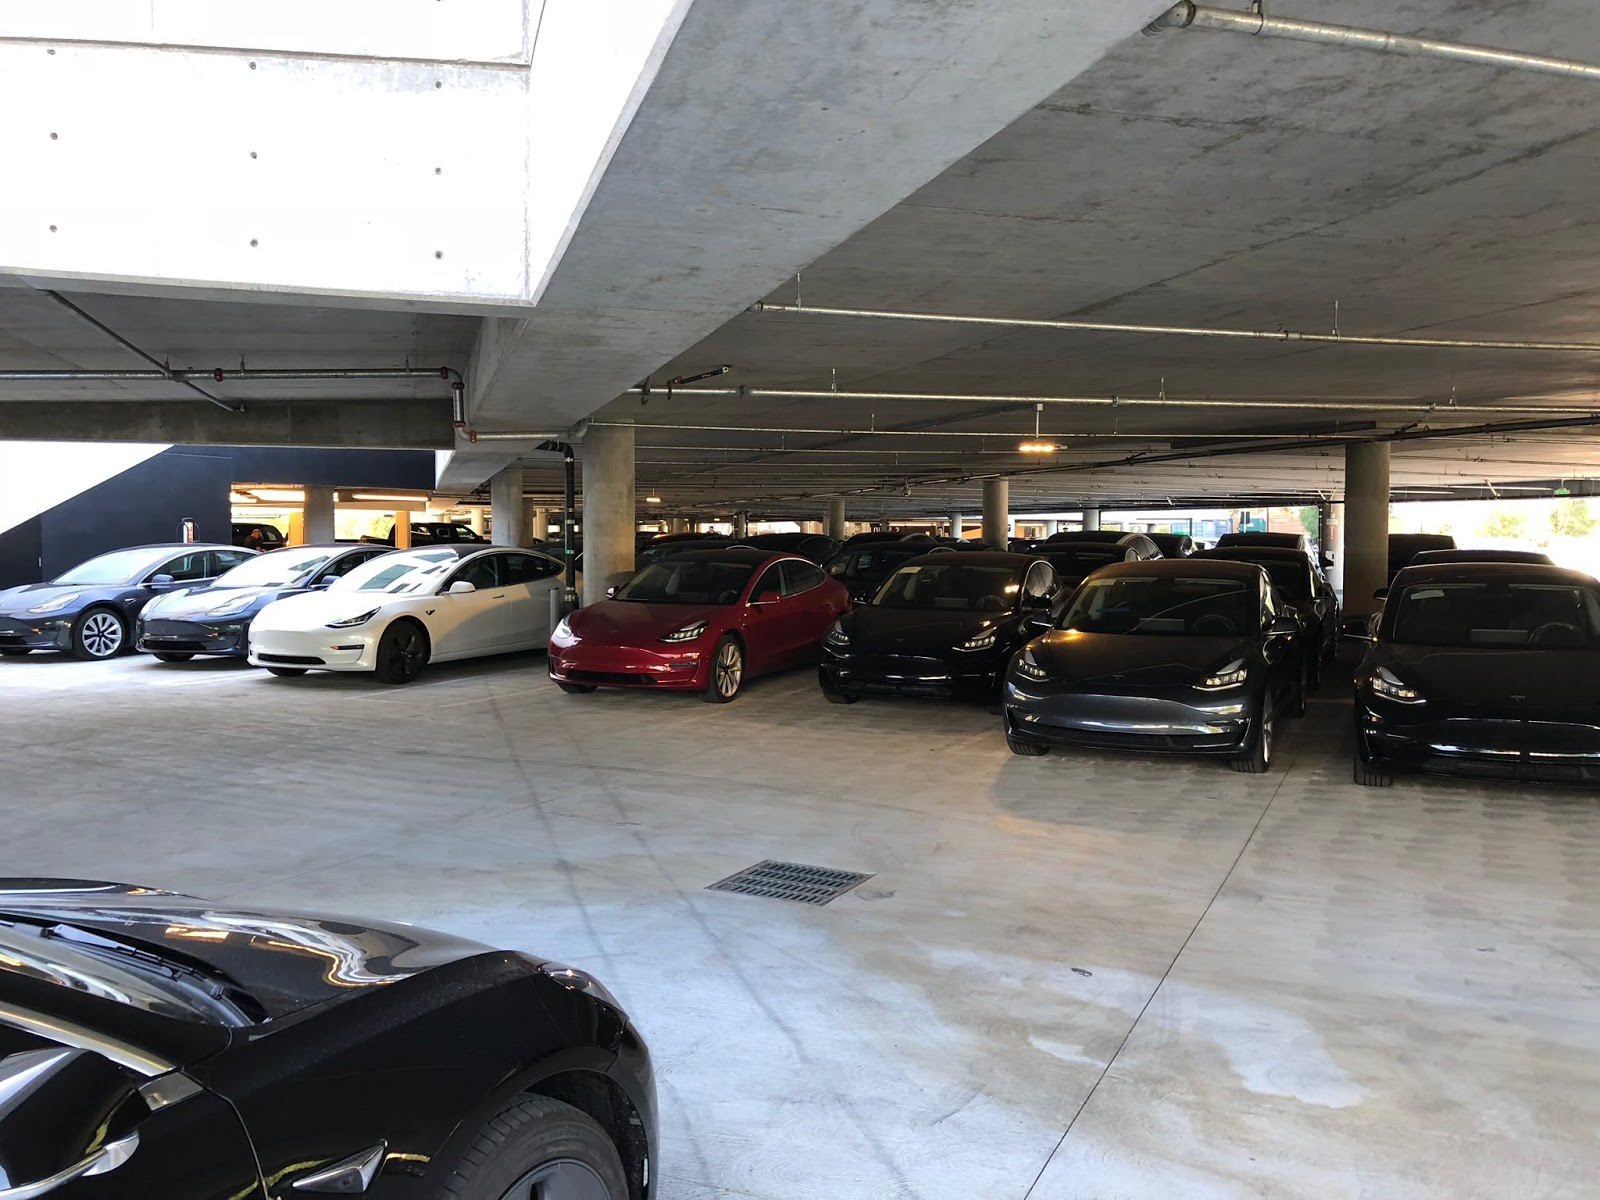 Tesla-LA-Parking-Lot-5